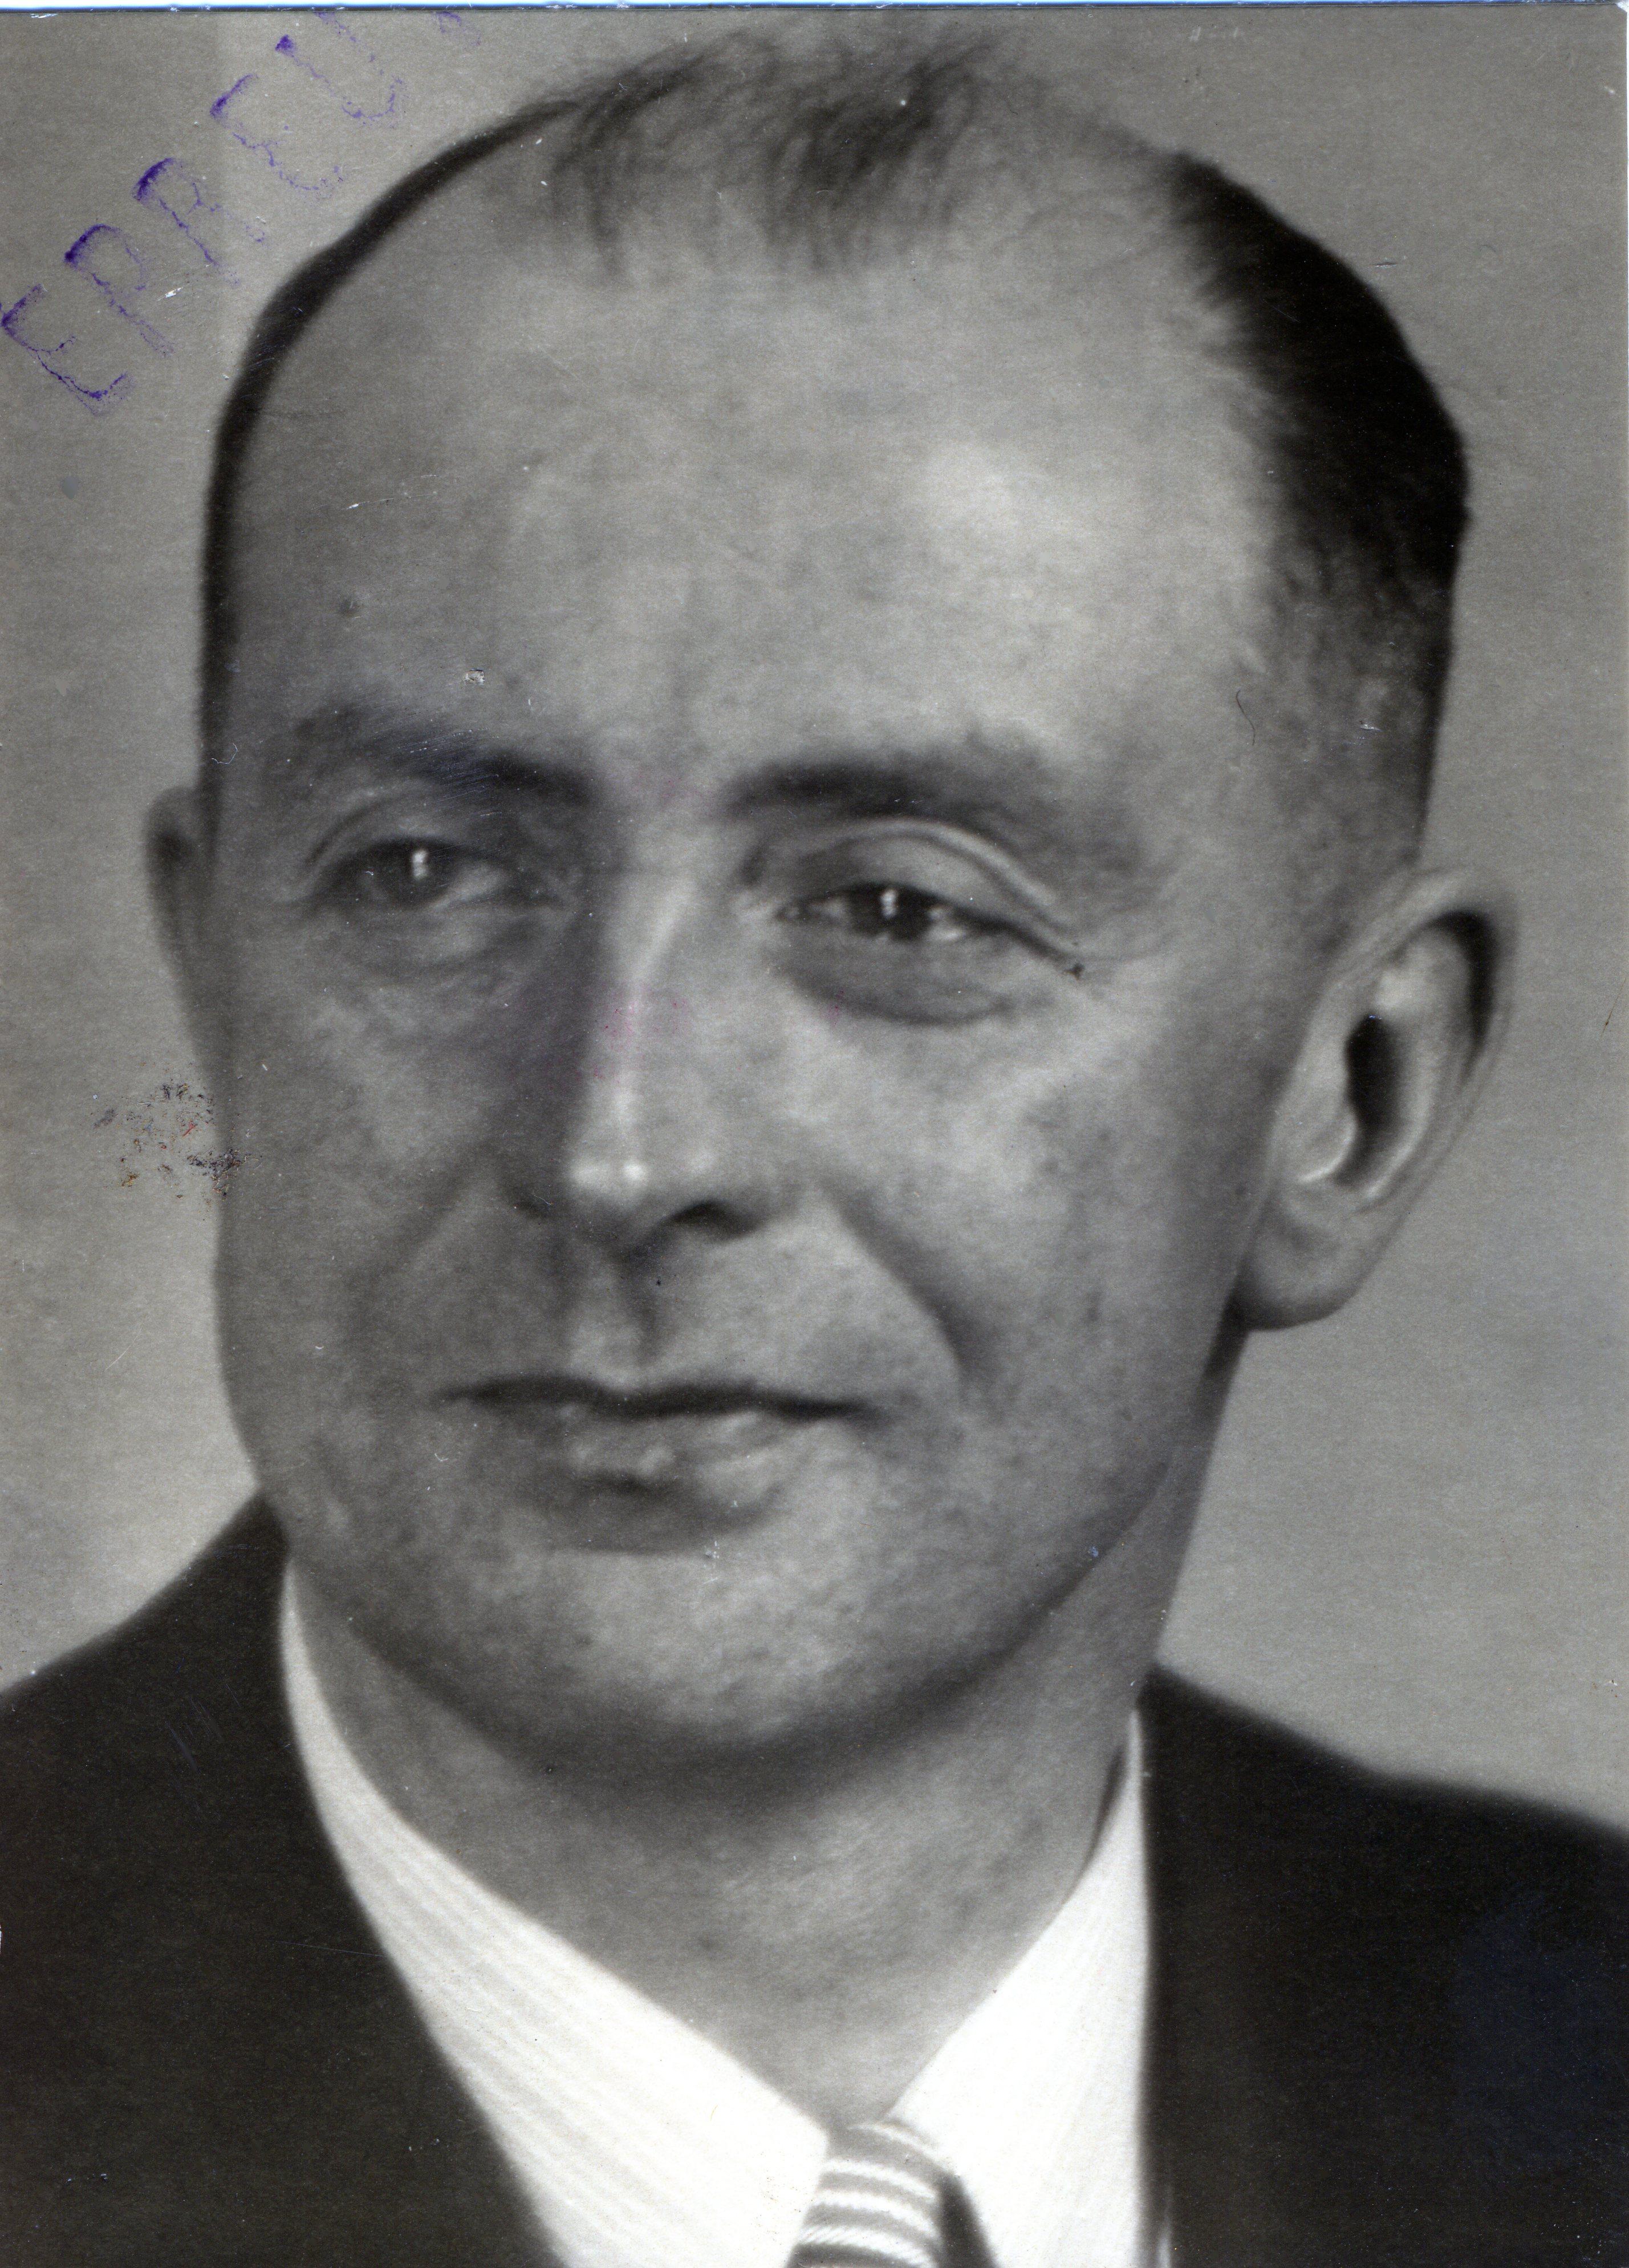 1942 - 1943